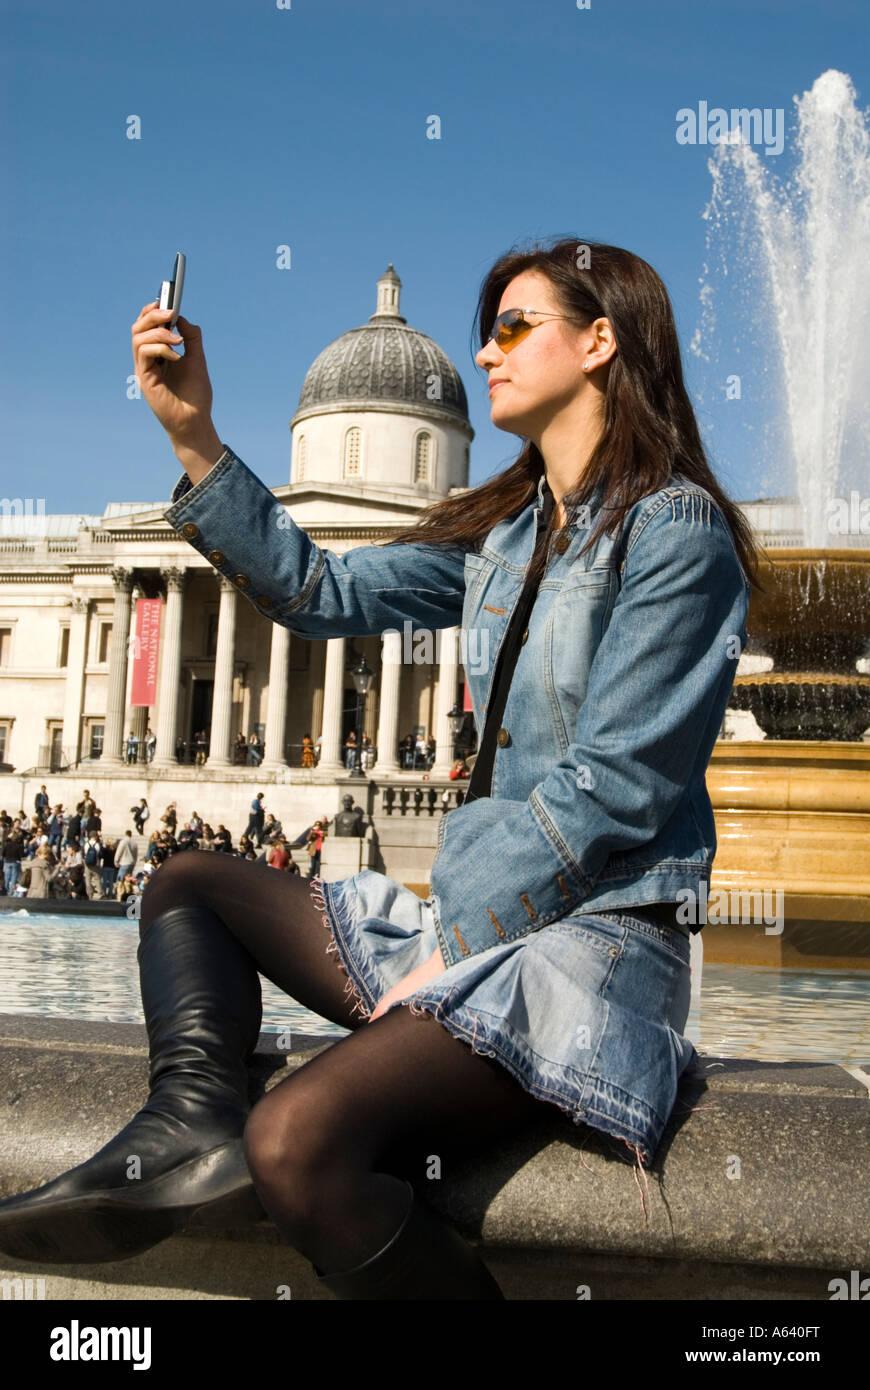 Beautiful young woman tourist taking photos with mobile phone camera at Trafalgar Square London England UK - Stock Image